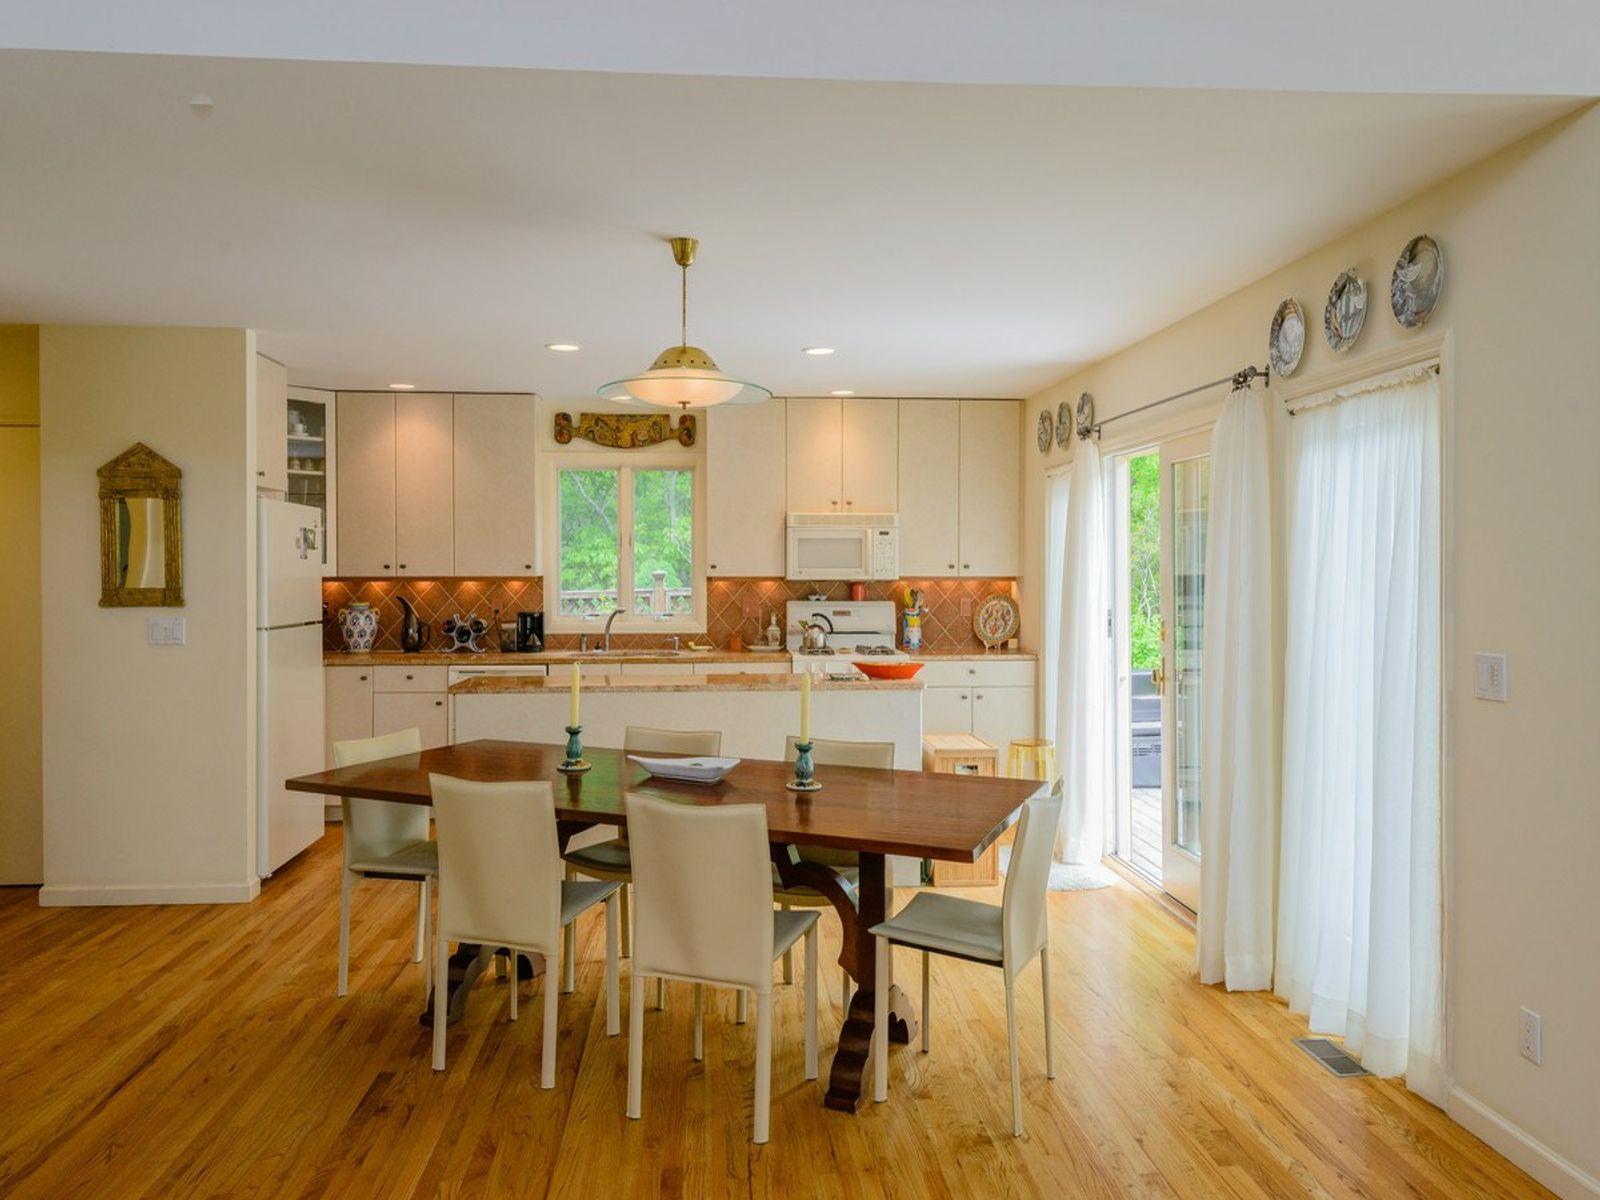 Interior Design to Perfection